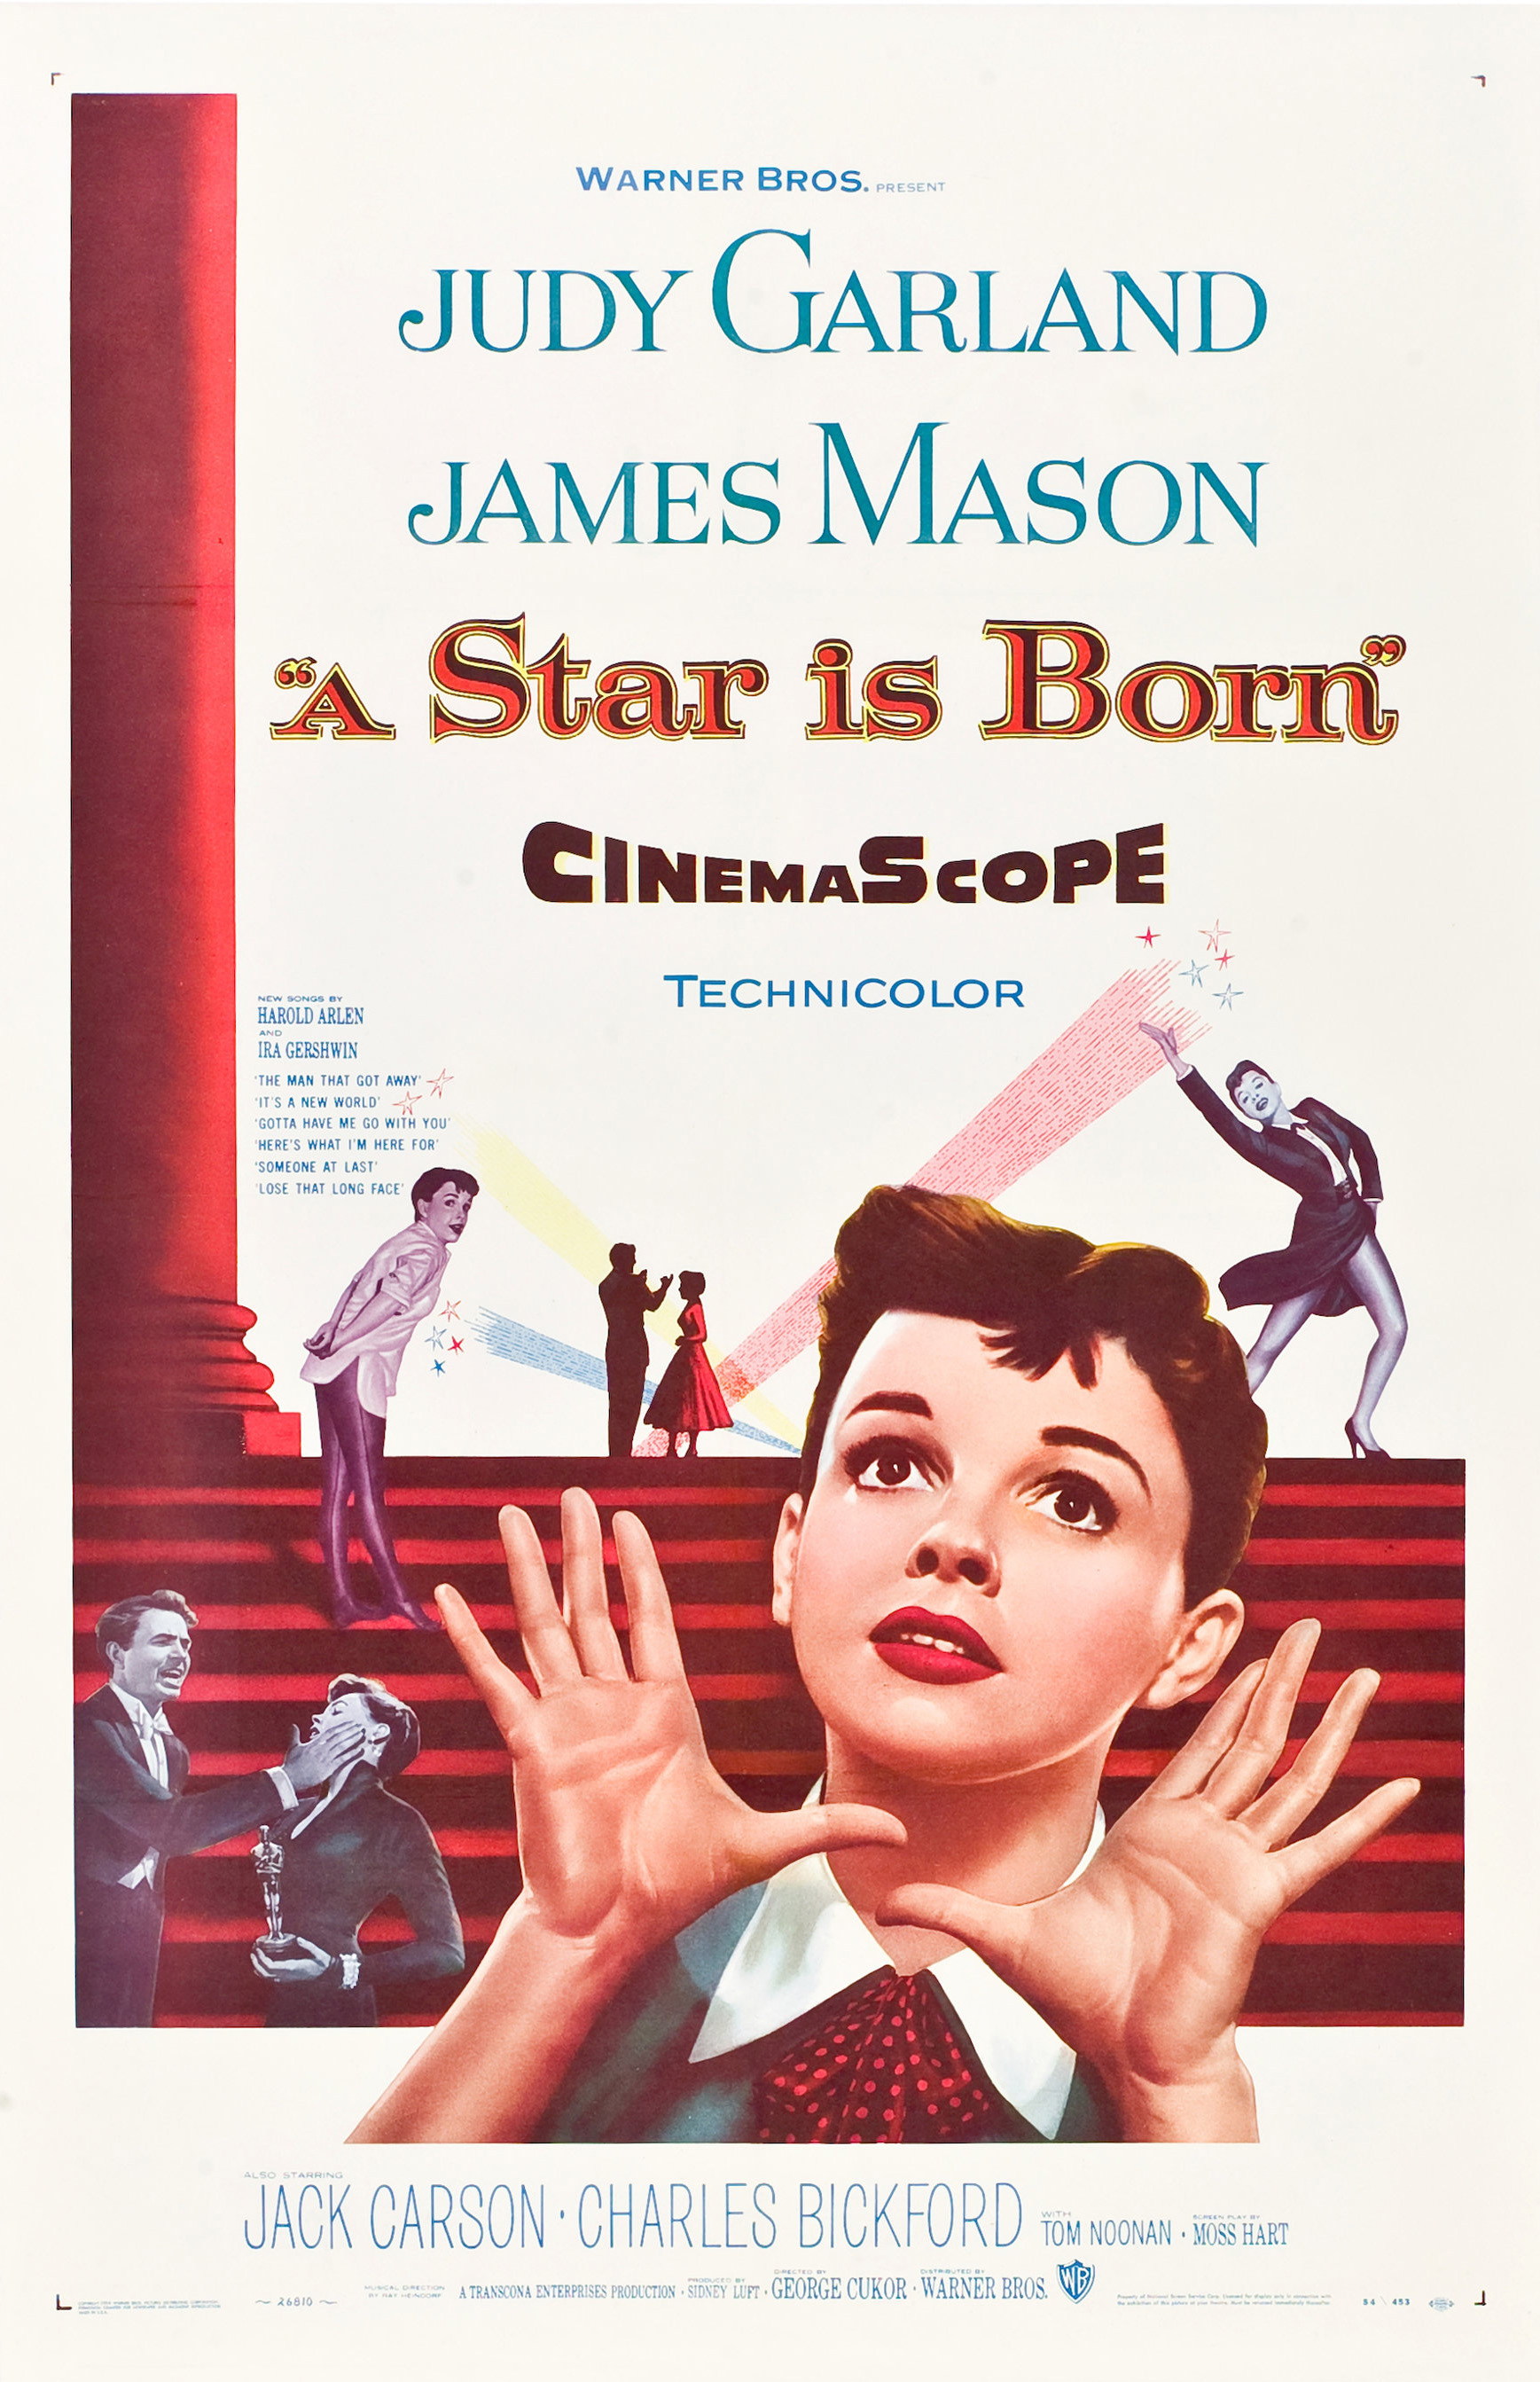 A Star Is Born 1954 Wikipédia A Enciclopédia Livre